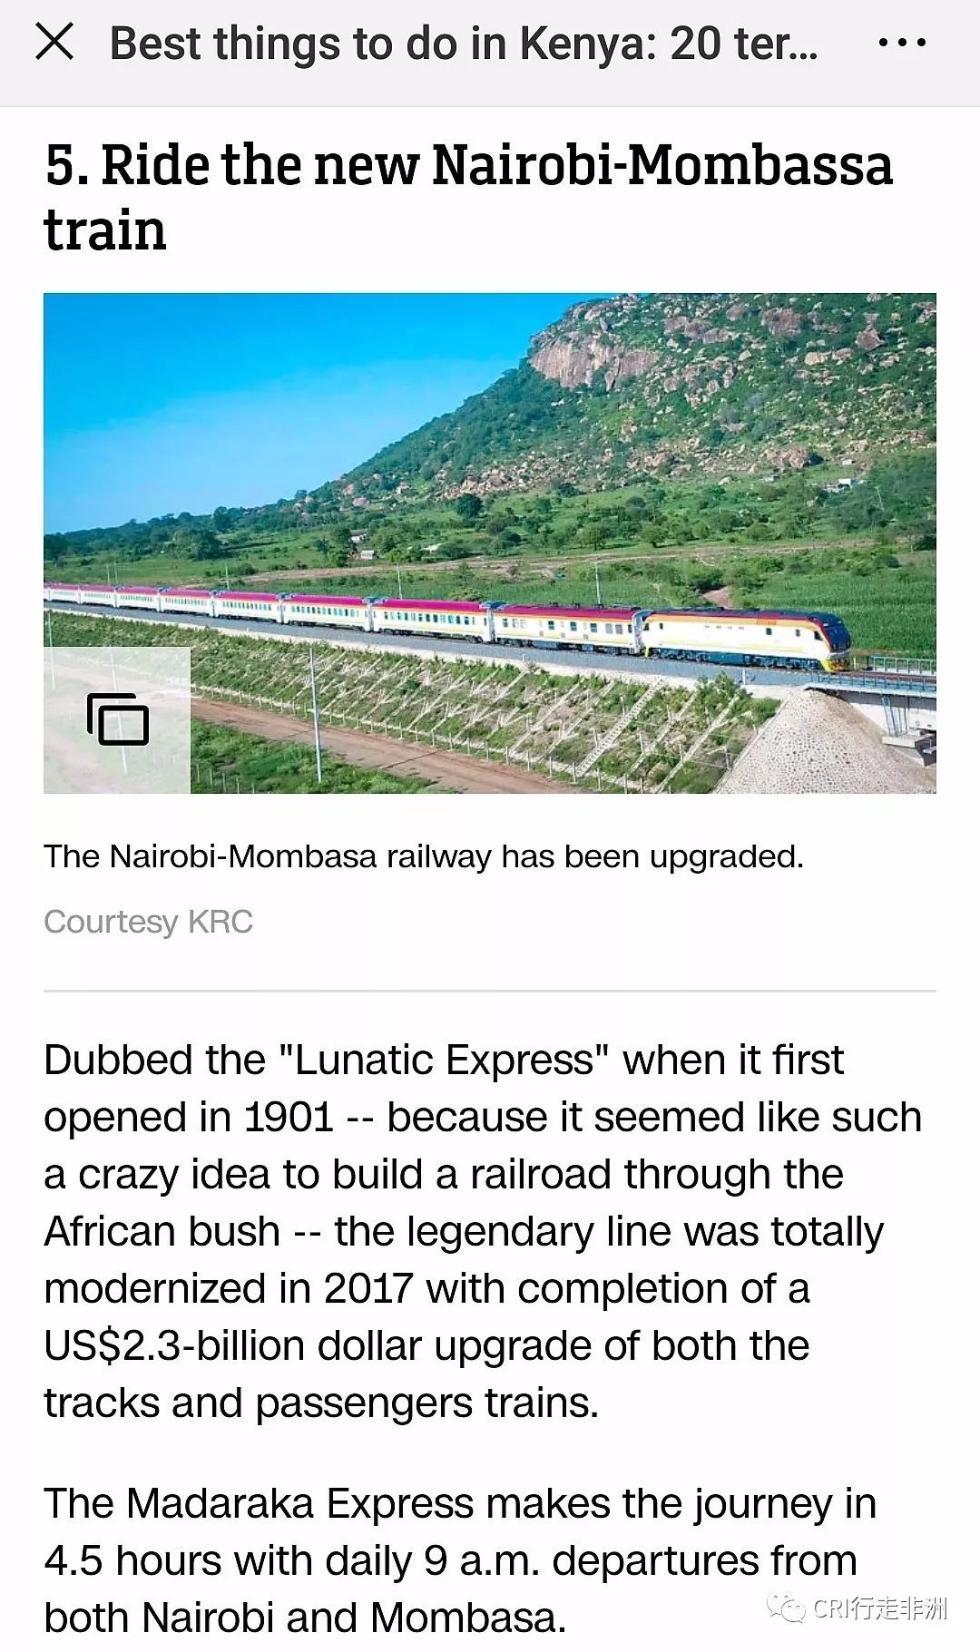 "CNN推荐在肯尼亚最值得做的20件事,""乘坐蒙内铁路列车""妥妥上榜"